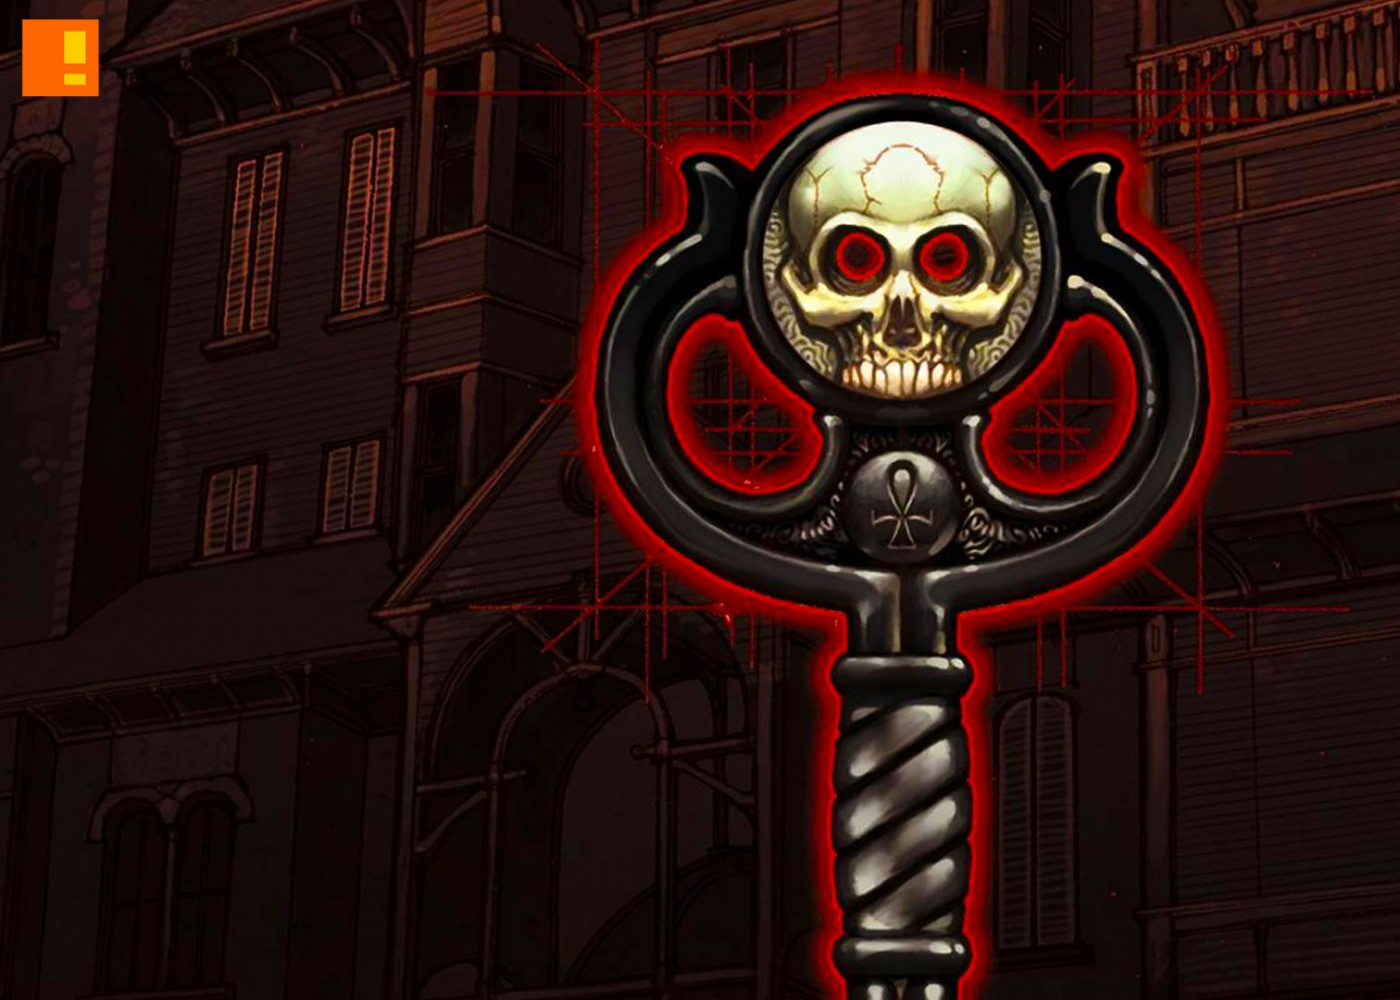 locke and key, locke & key, idw entertainment , comic tv series, joe hill, david ozer,the action pixel, entertainment on tap